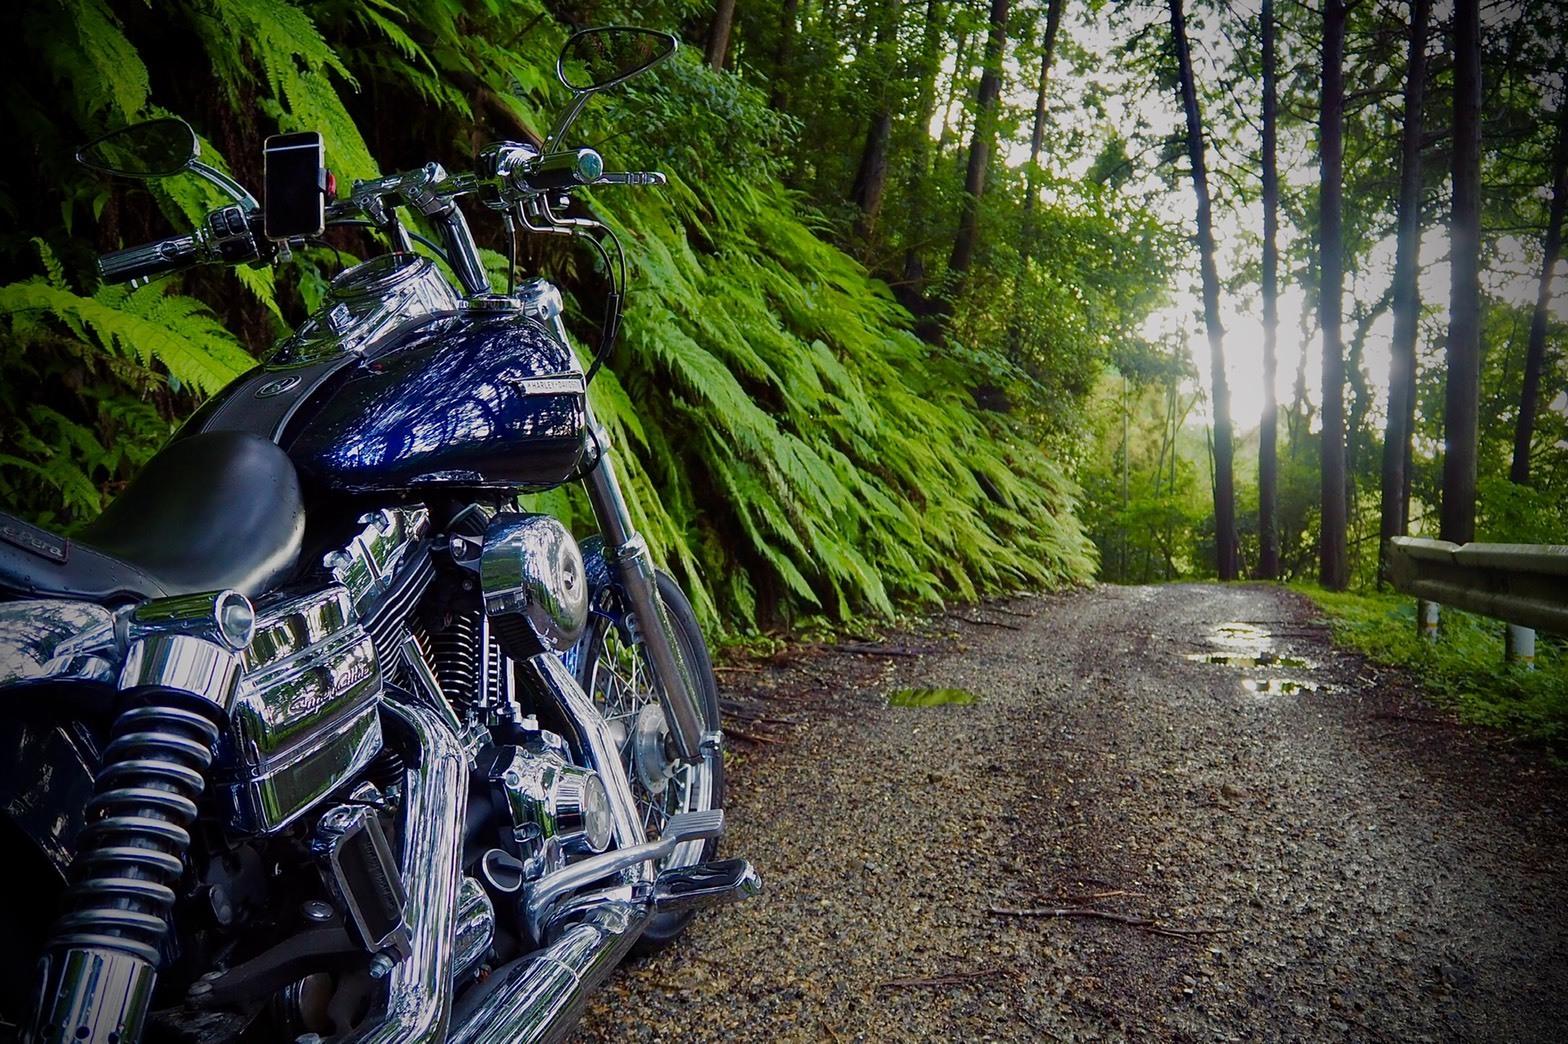 harleydavidson-motorcycle-touring-kyoto-ryuoh-waterfall-road-badroad.jpg